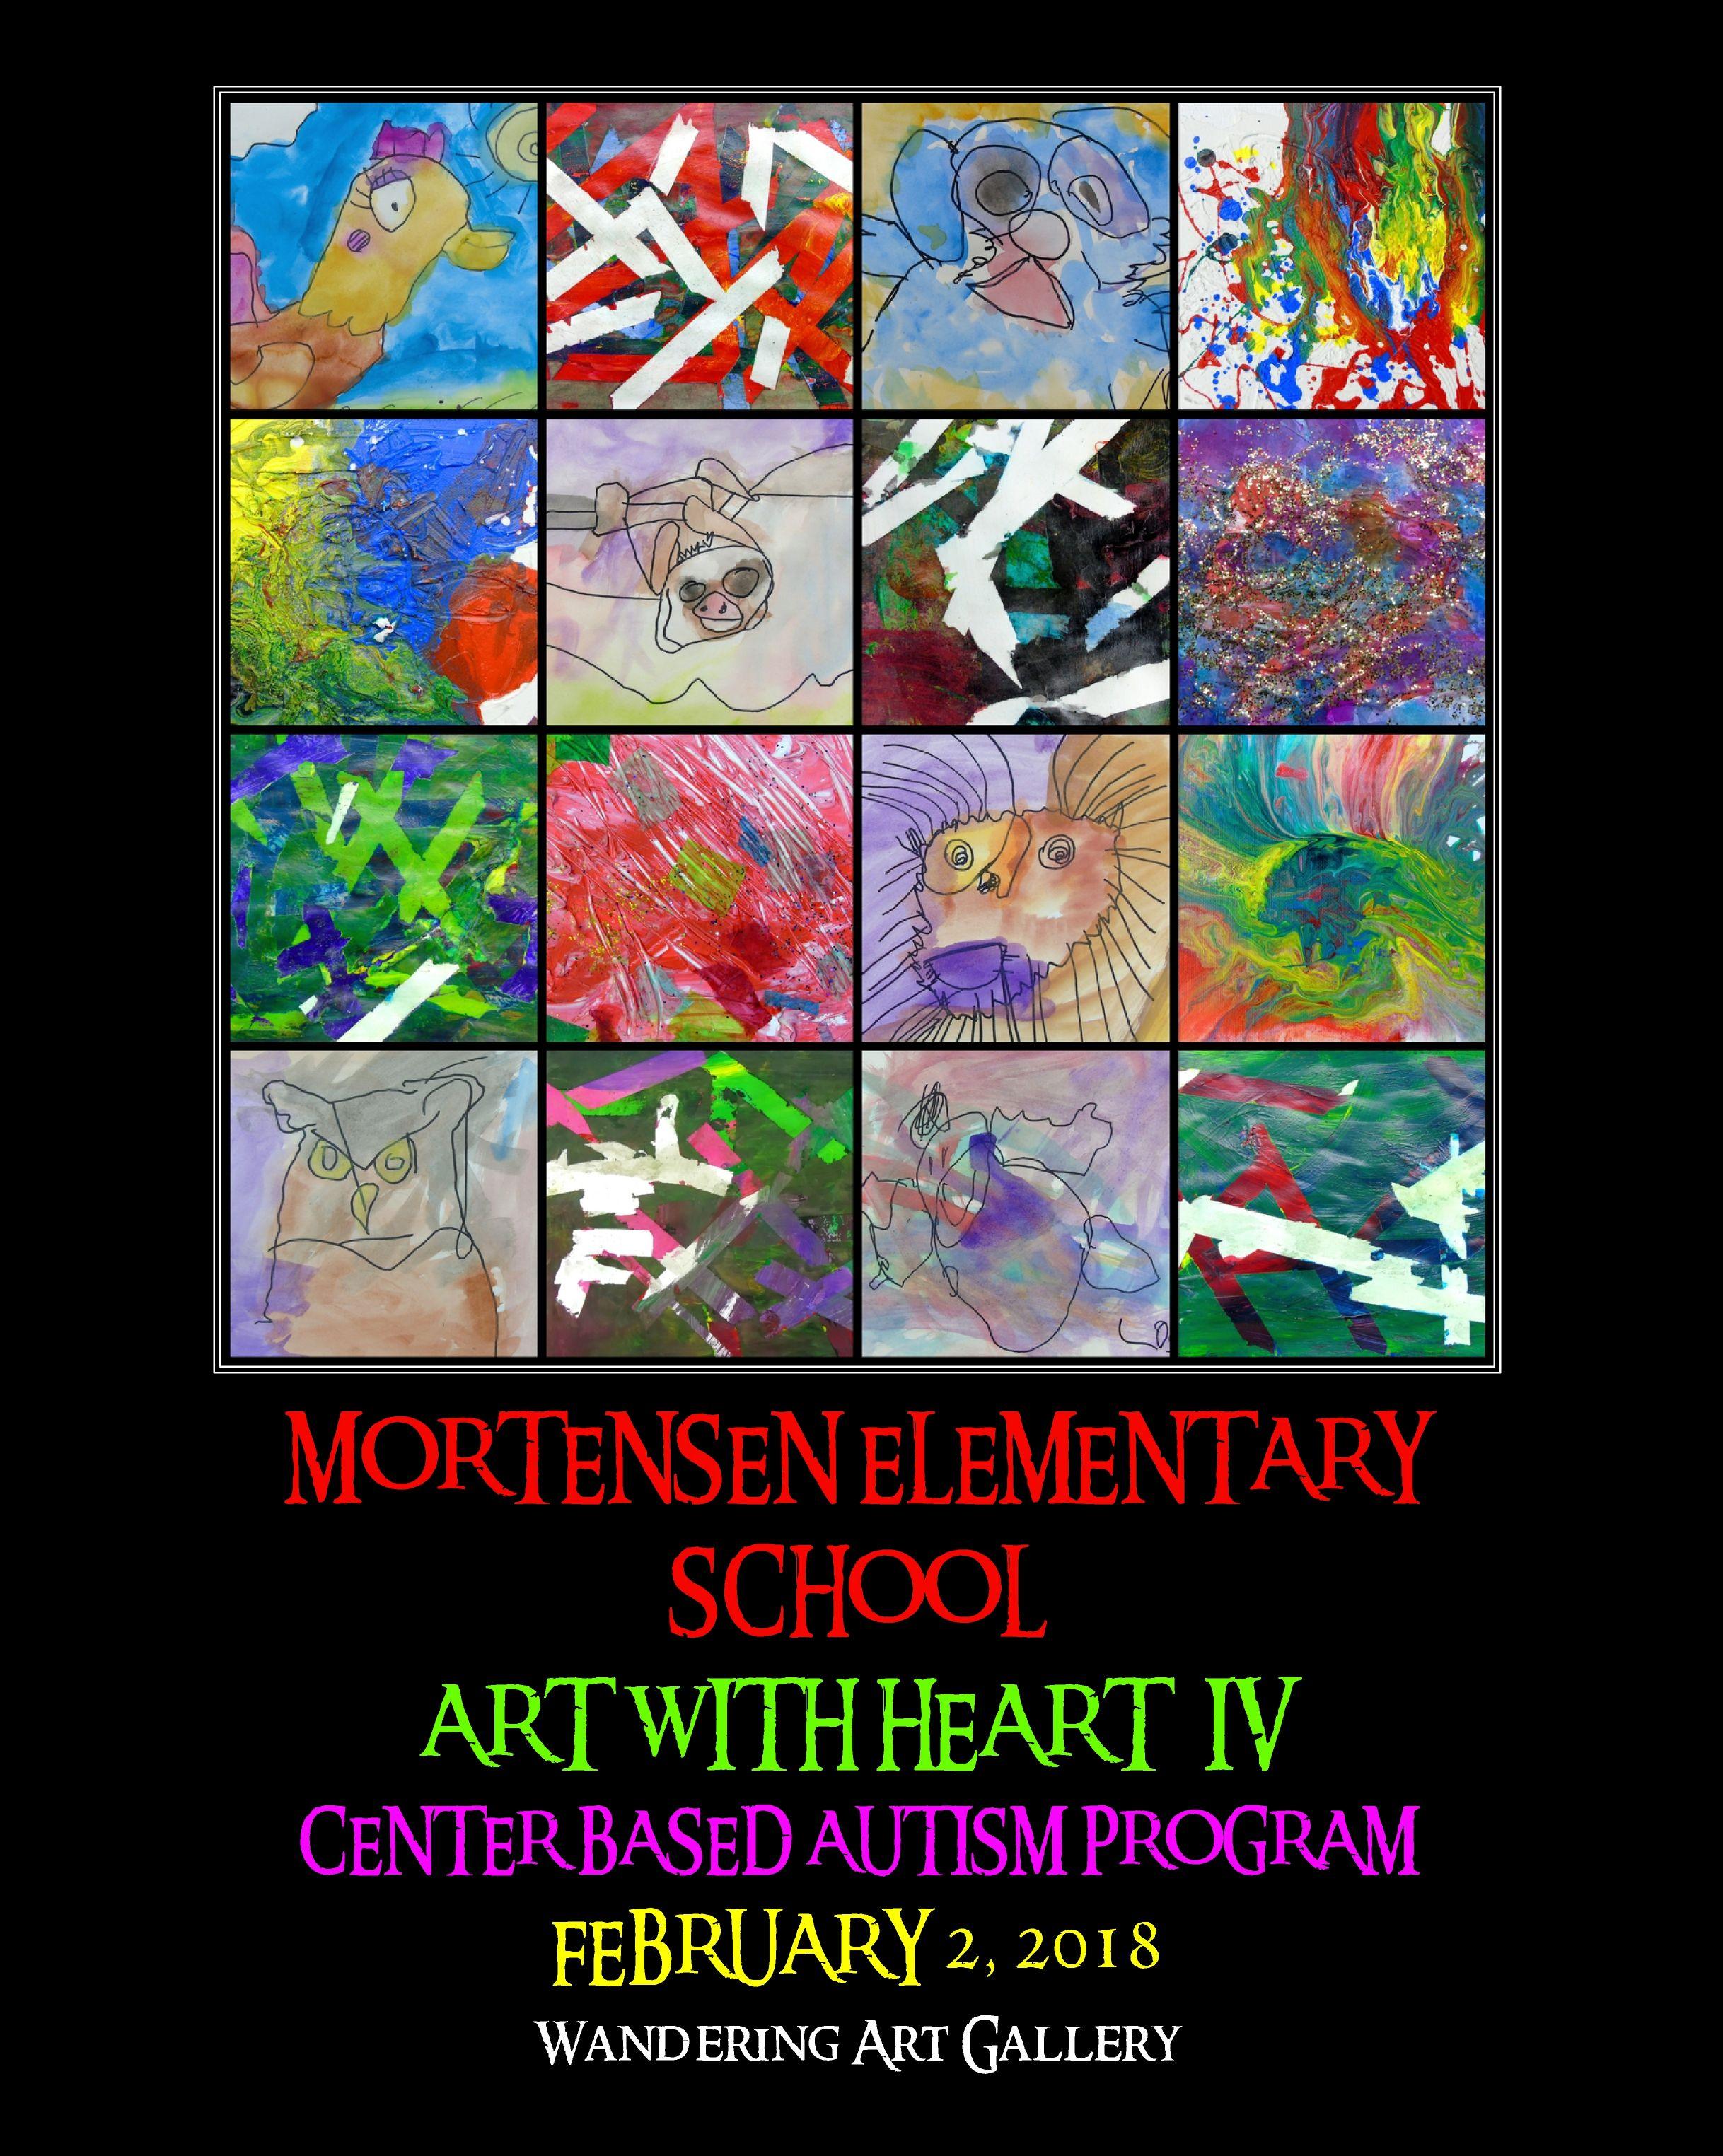 mortensen iv poster and prints 8x10.jpg